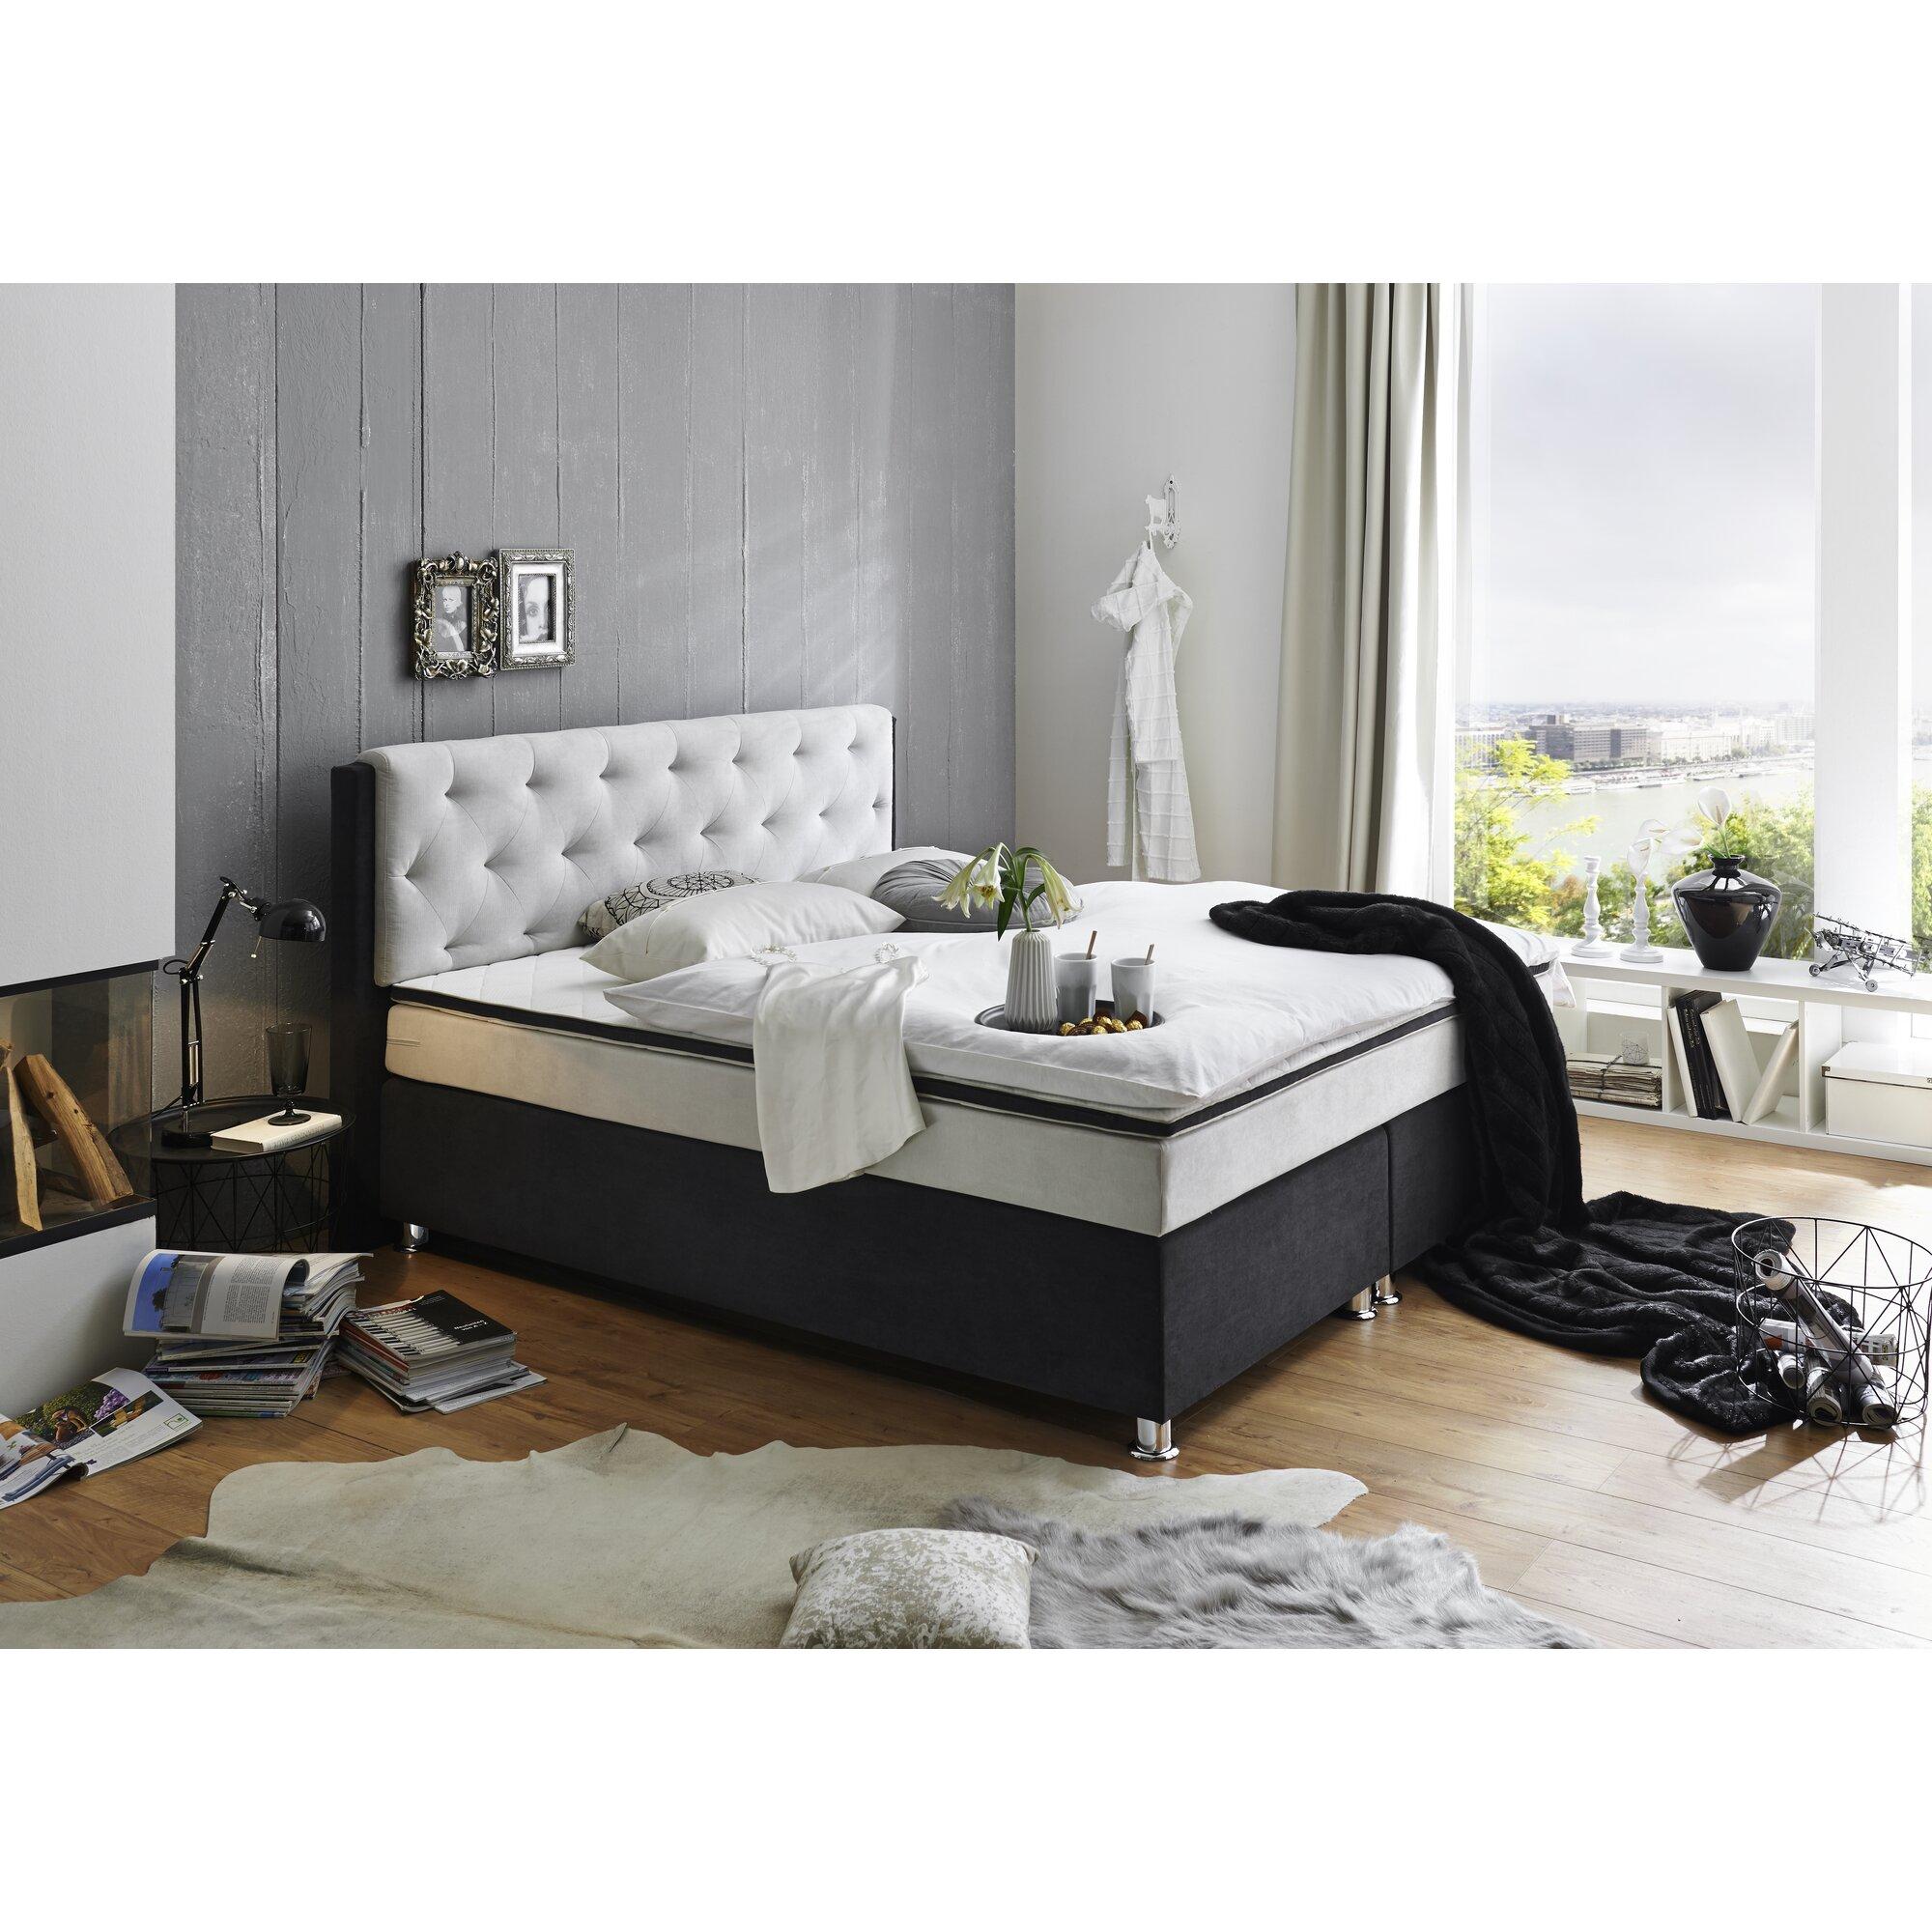 atlantic home collection boxspringbett ron mit topper. Black Bedroom Furniture Sets. Home Design Ideas